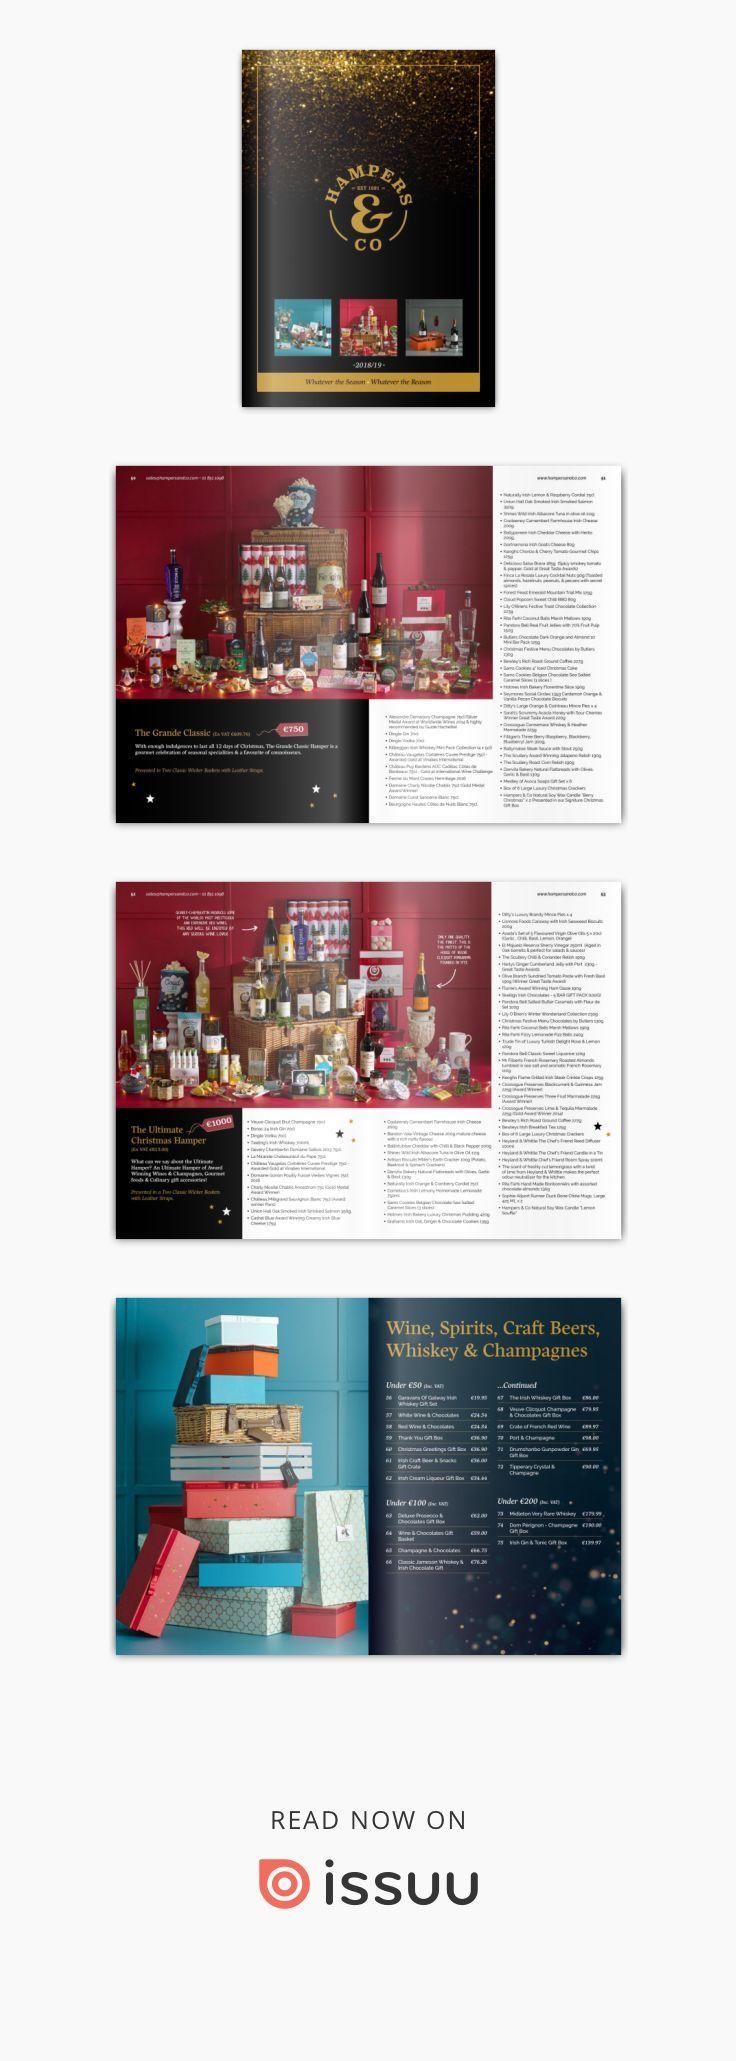 Hampers & Co 2018/2019 Brochure Luxury hampers